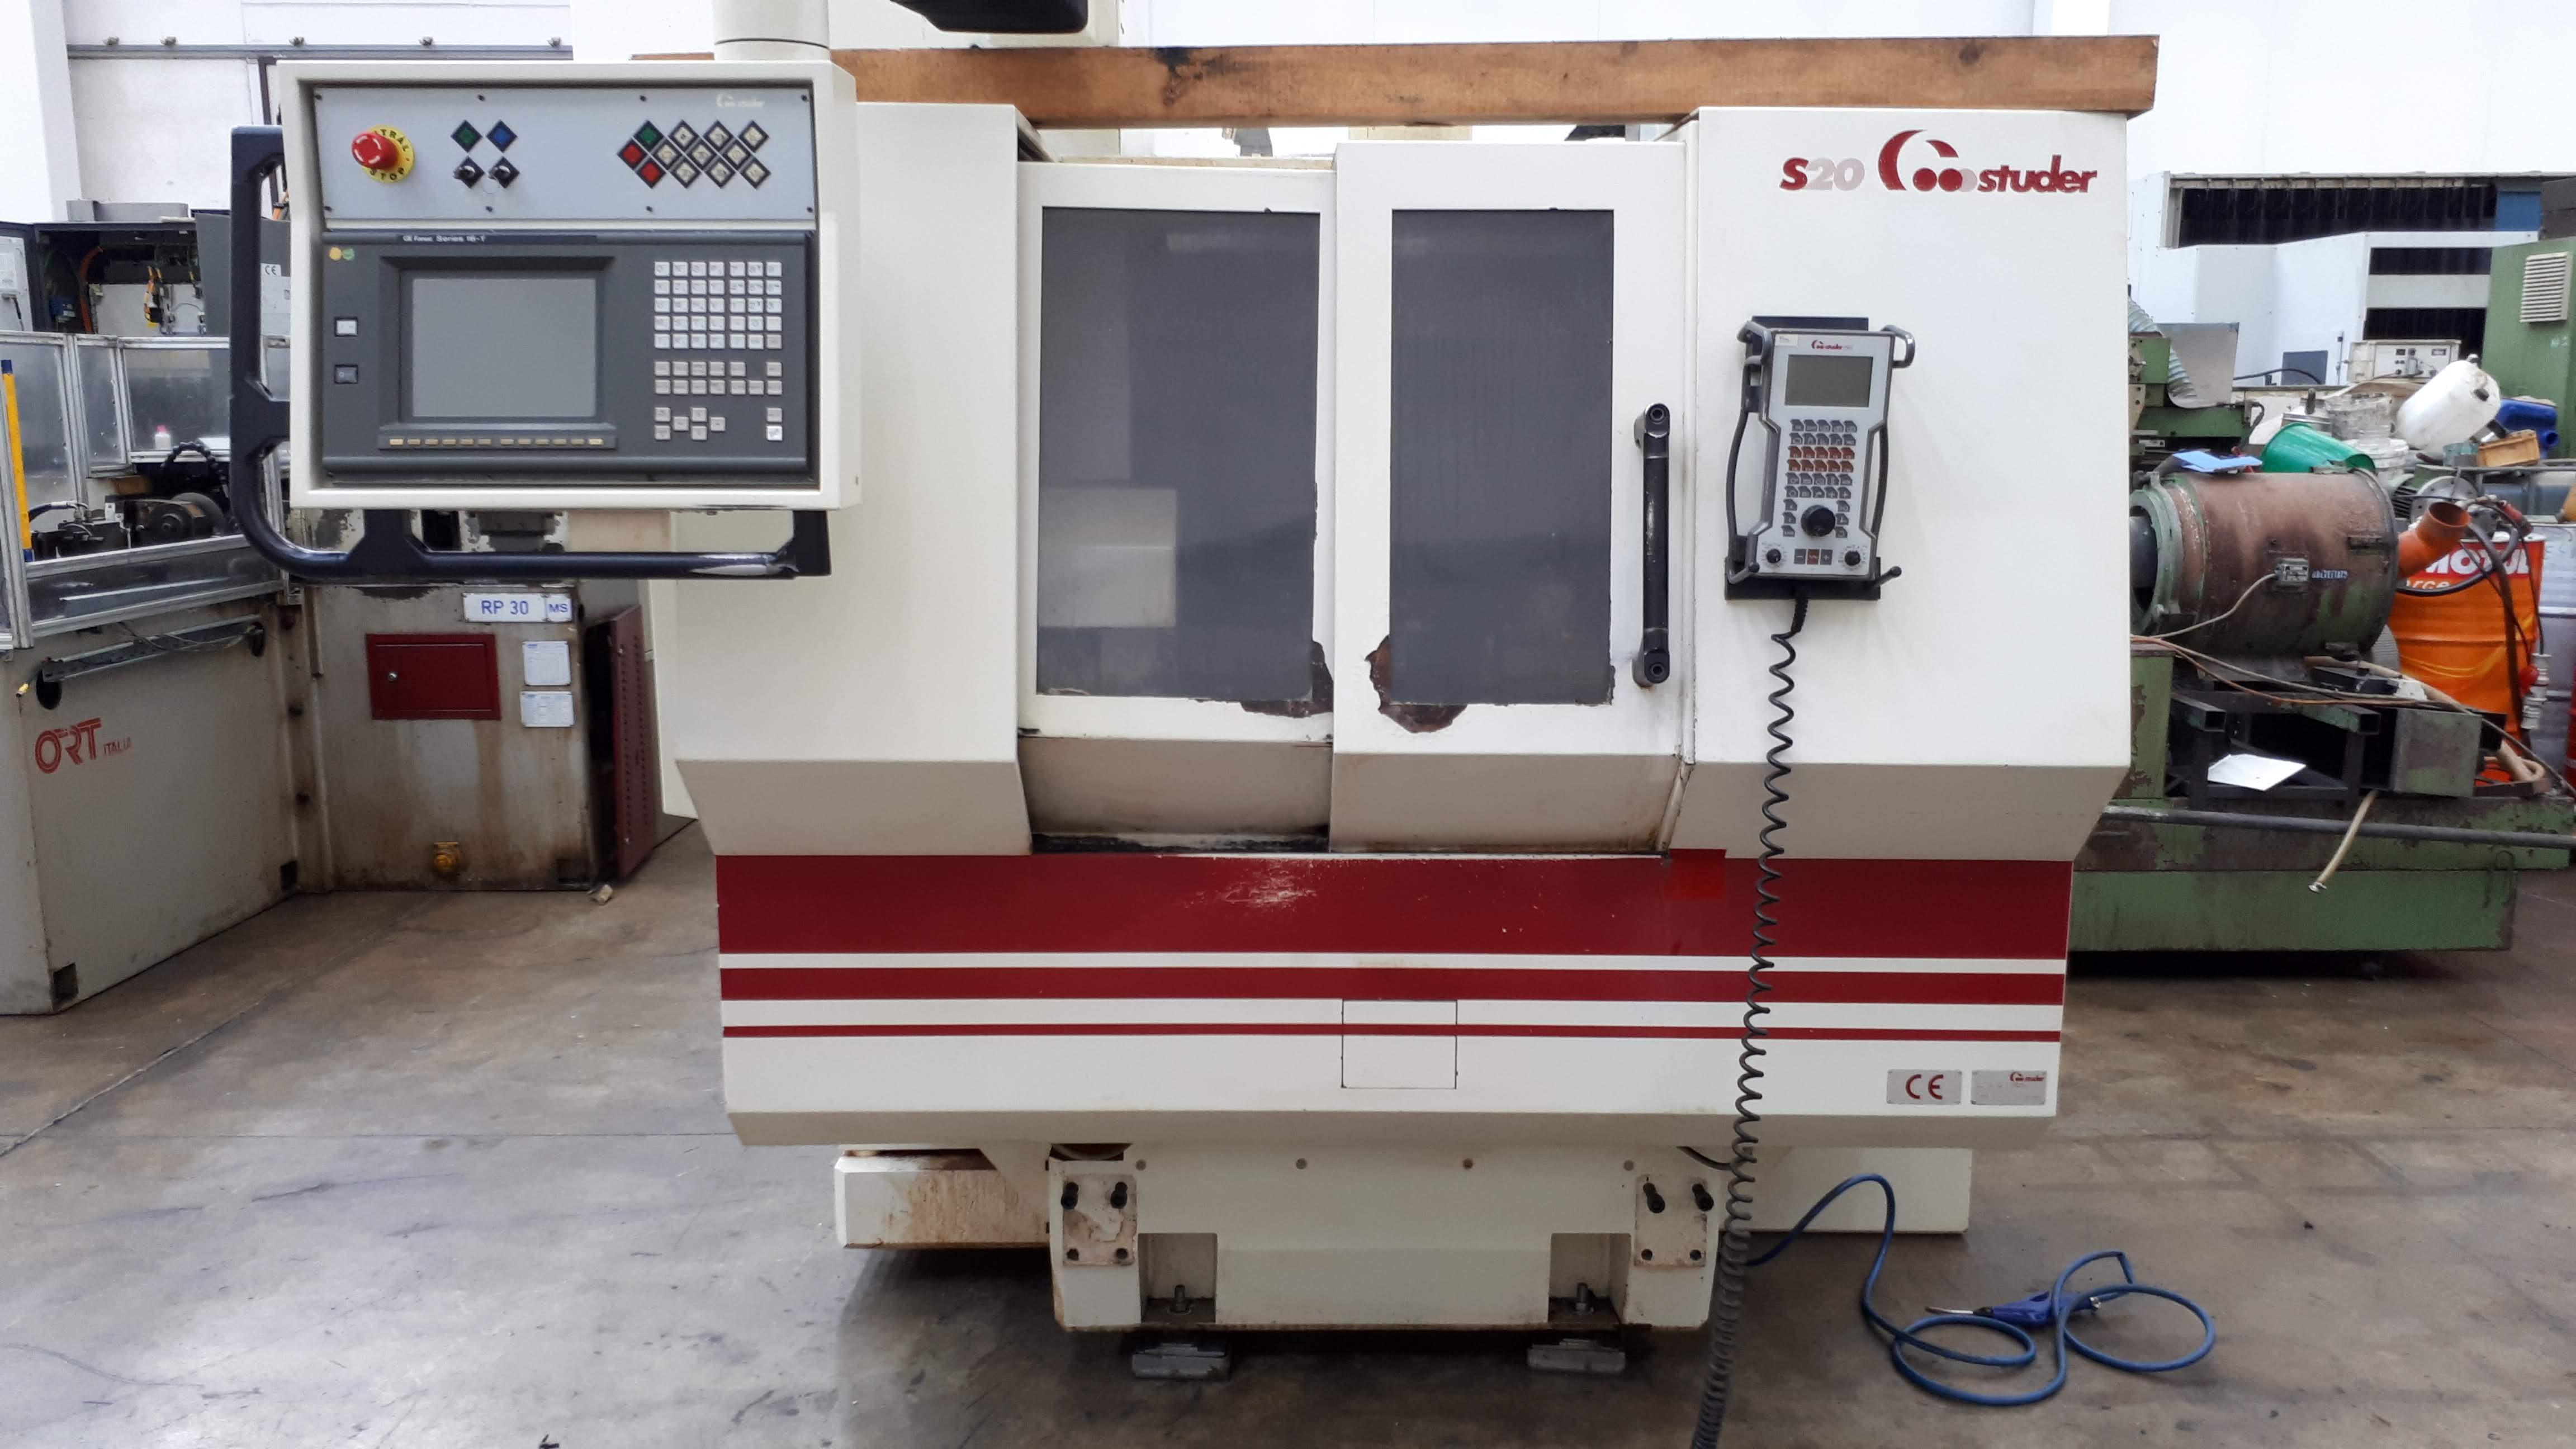 2000 Studer S20 CNC